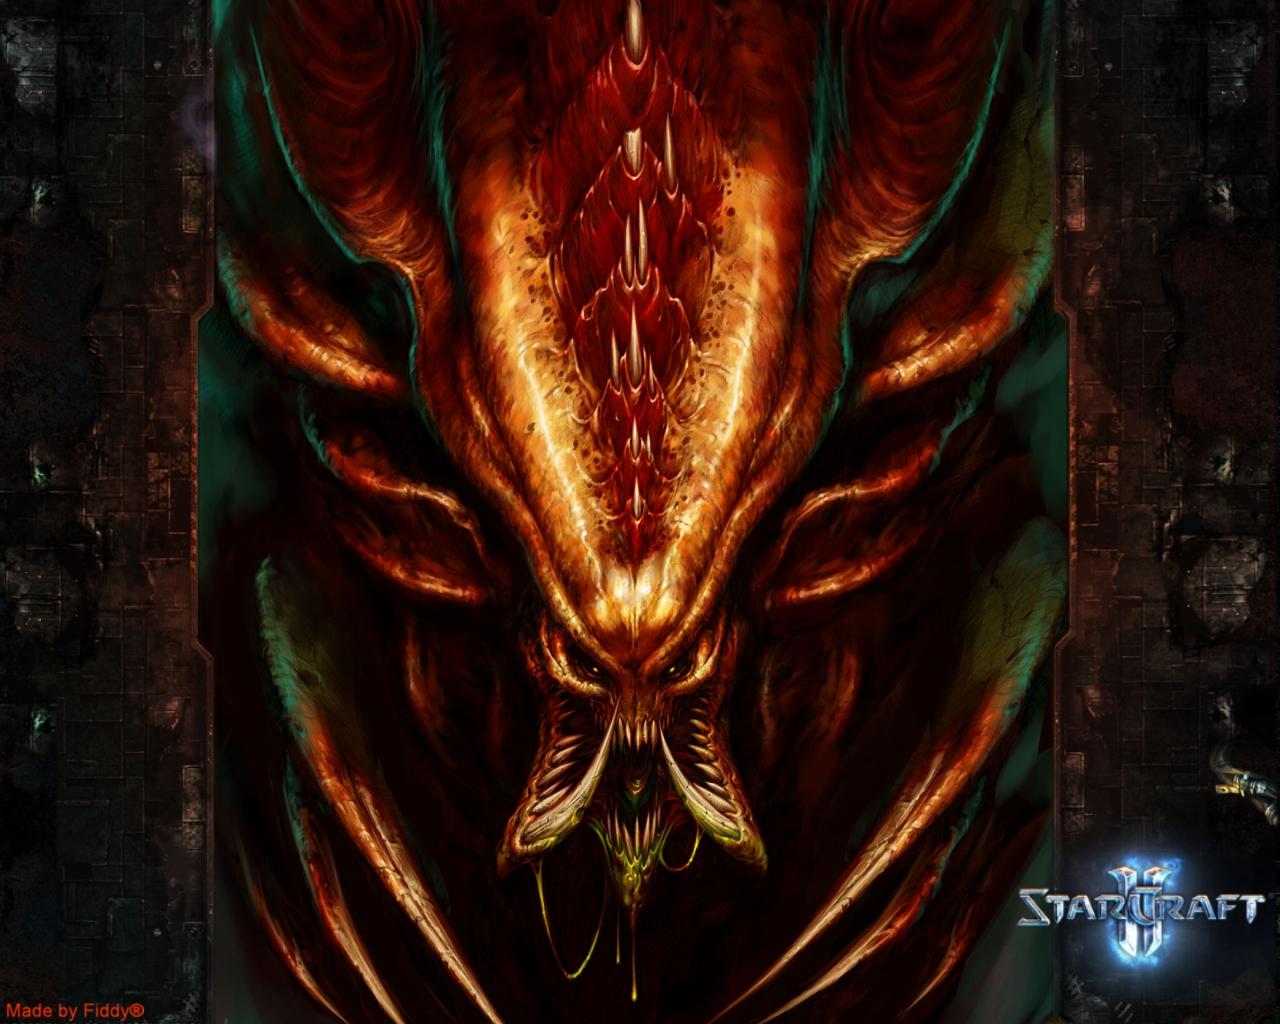 Image Starcraft Starcraft 2 Games